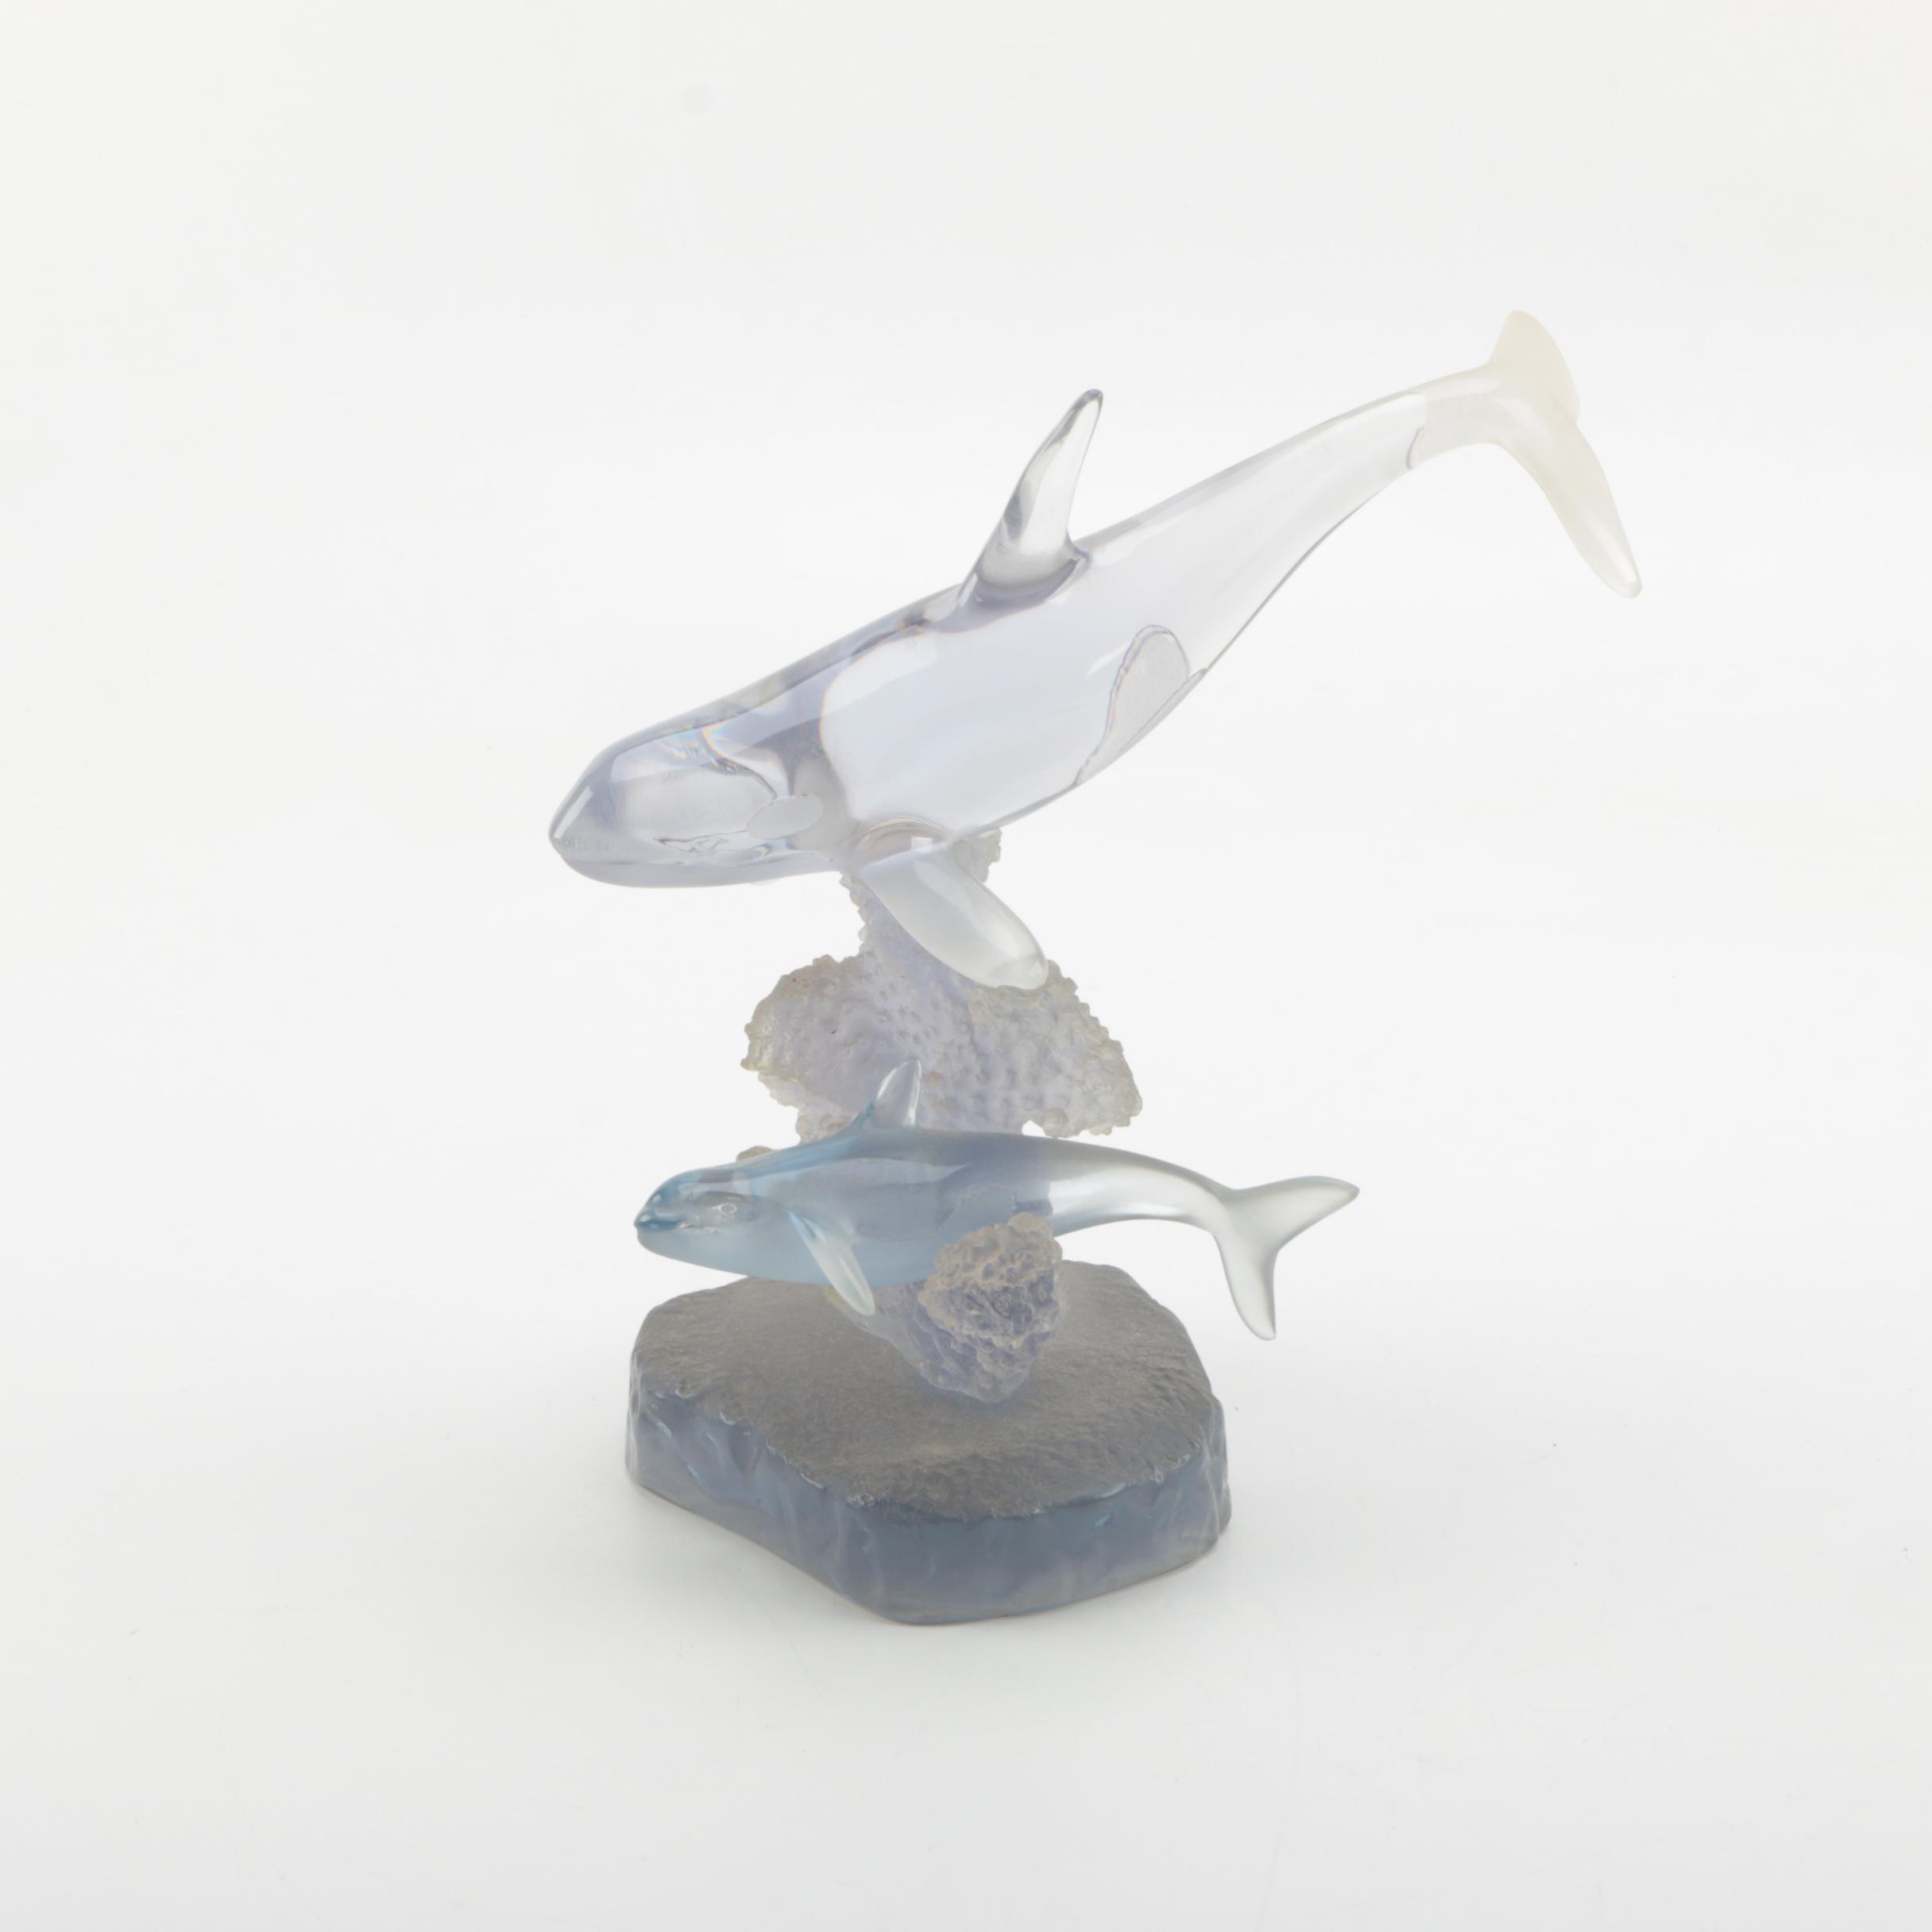 Wyland Acrylic Sculpture of Porpoises